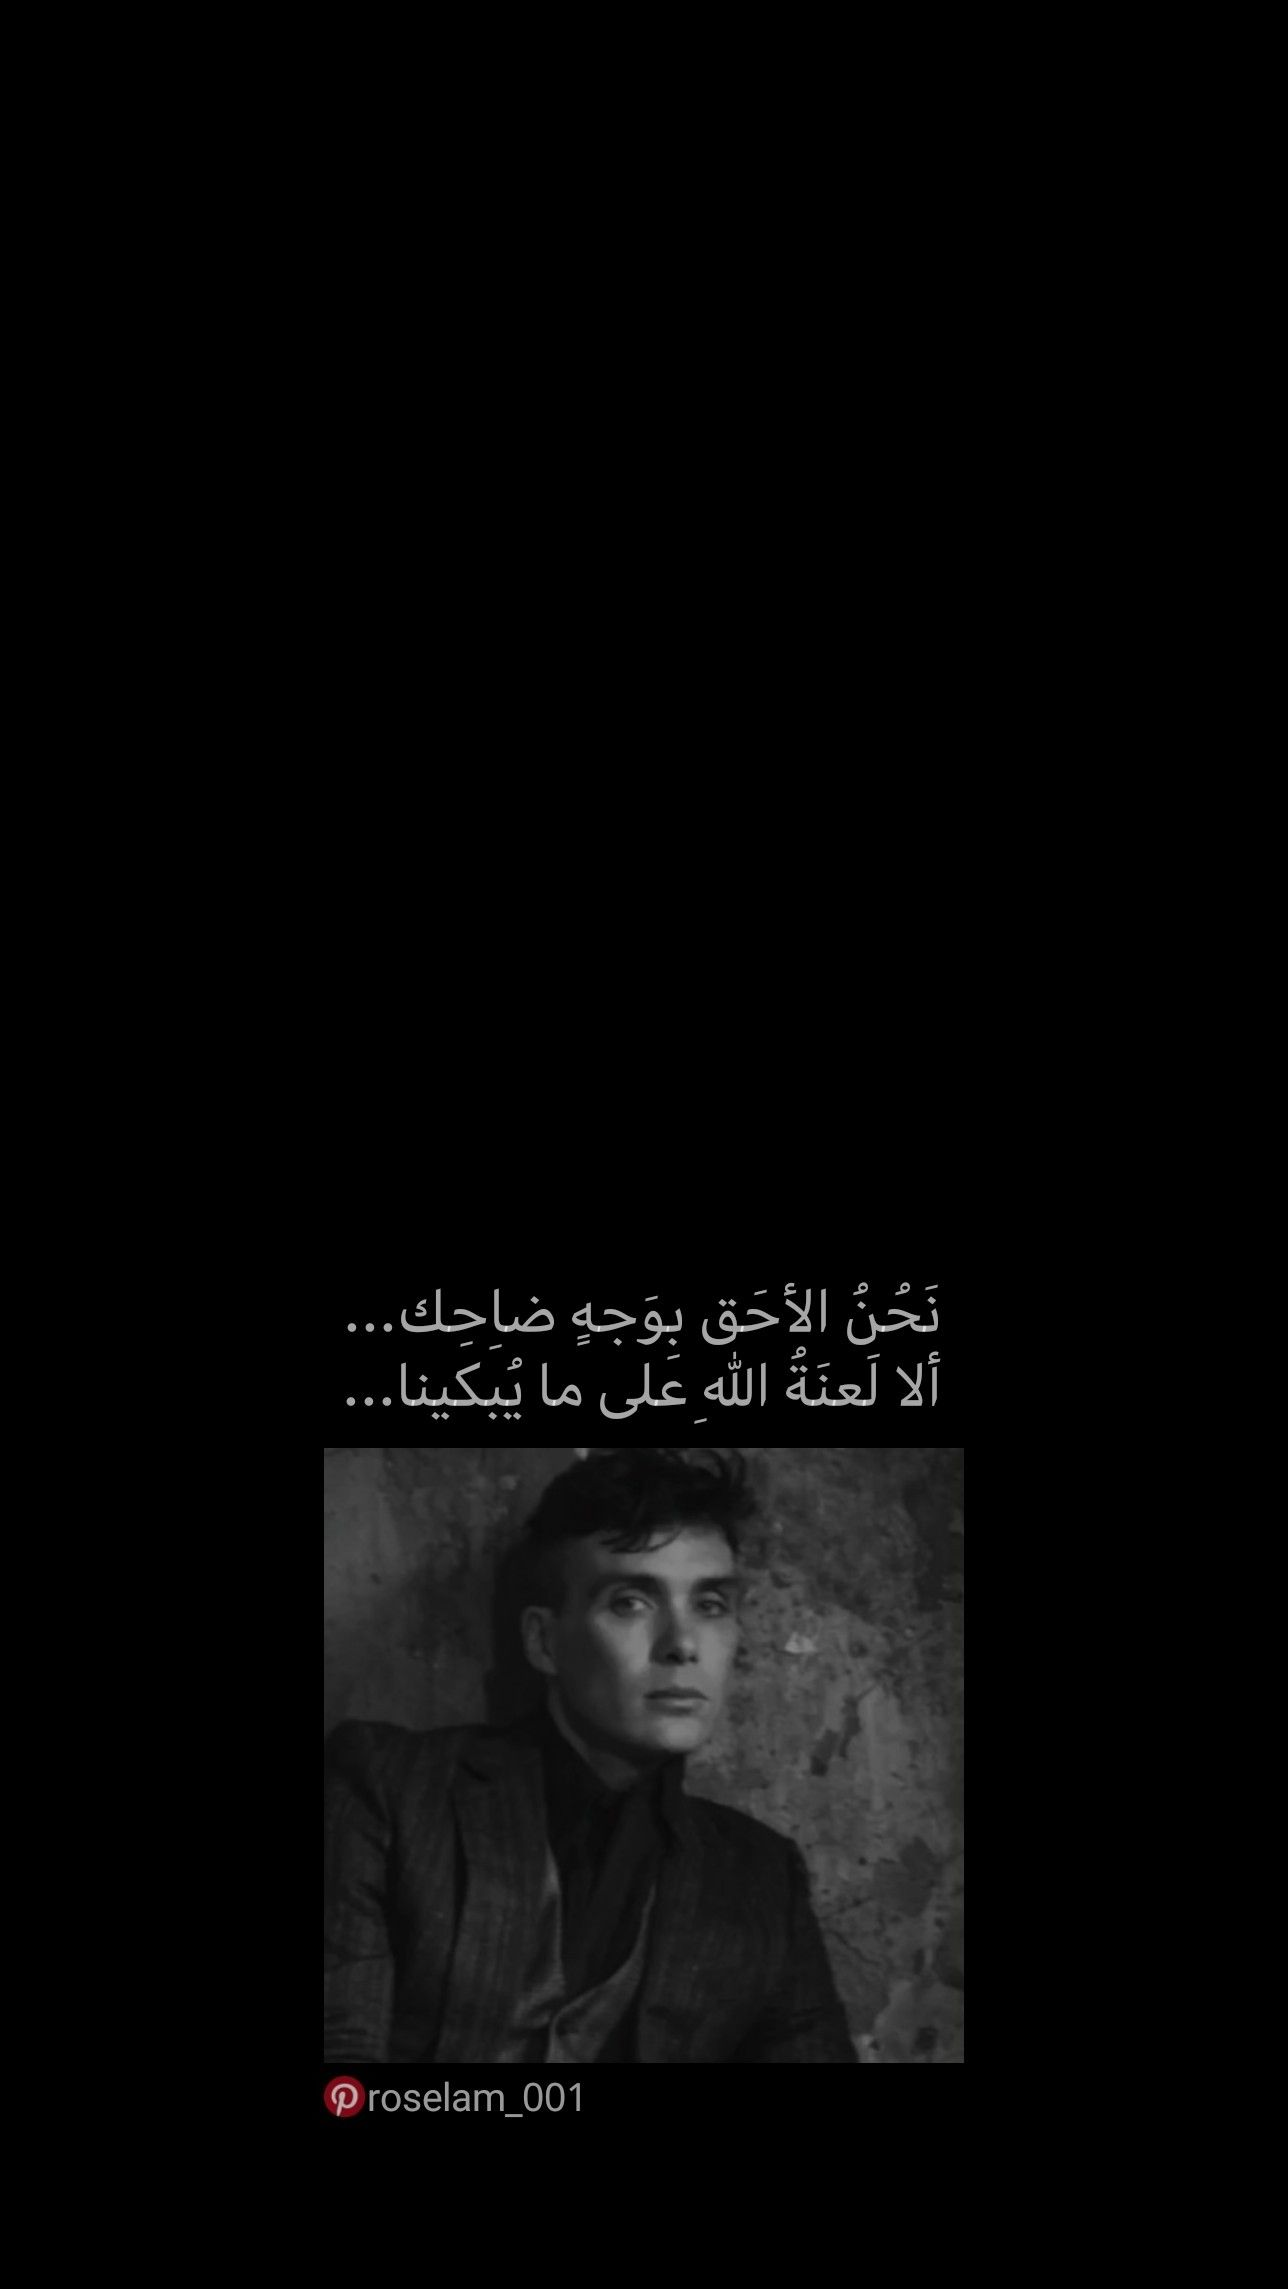 Pin By ر س ل On My Saves Fun Love Quotes For Him Best Love Quotes Love Quotes For Him